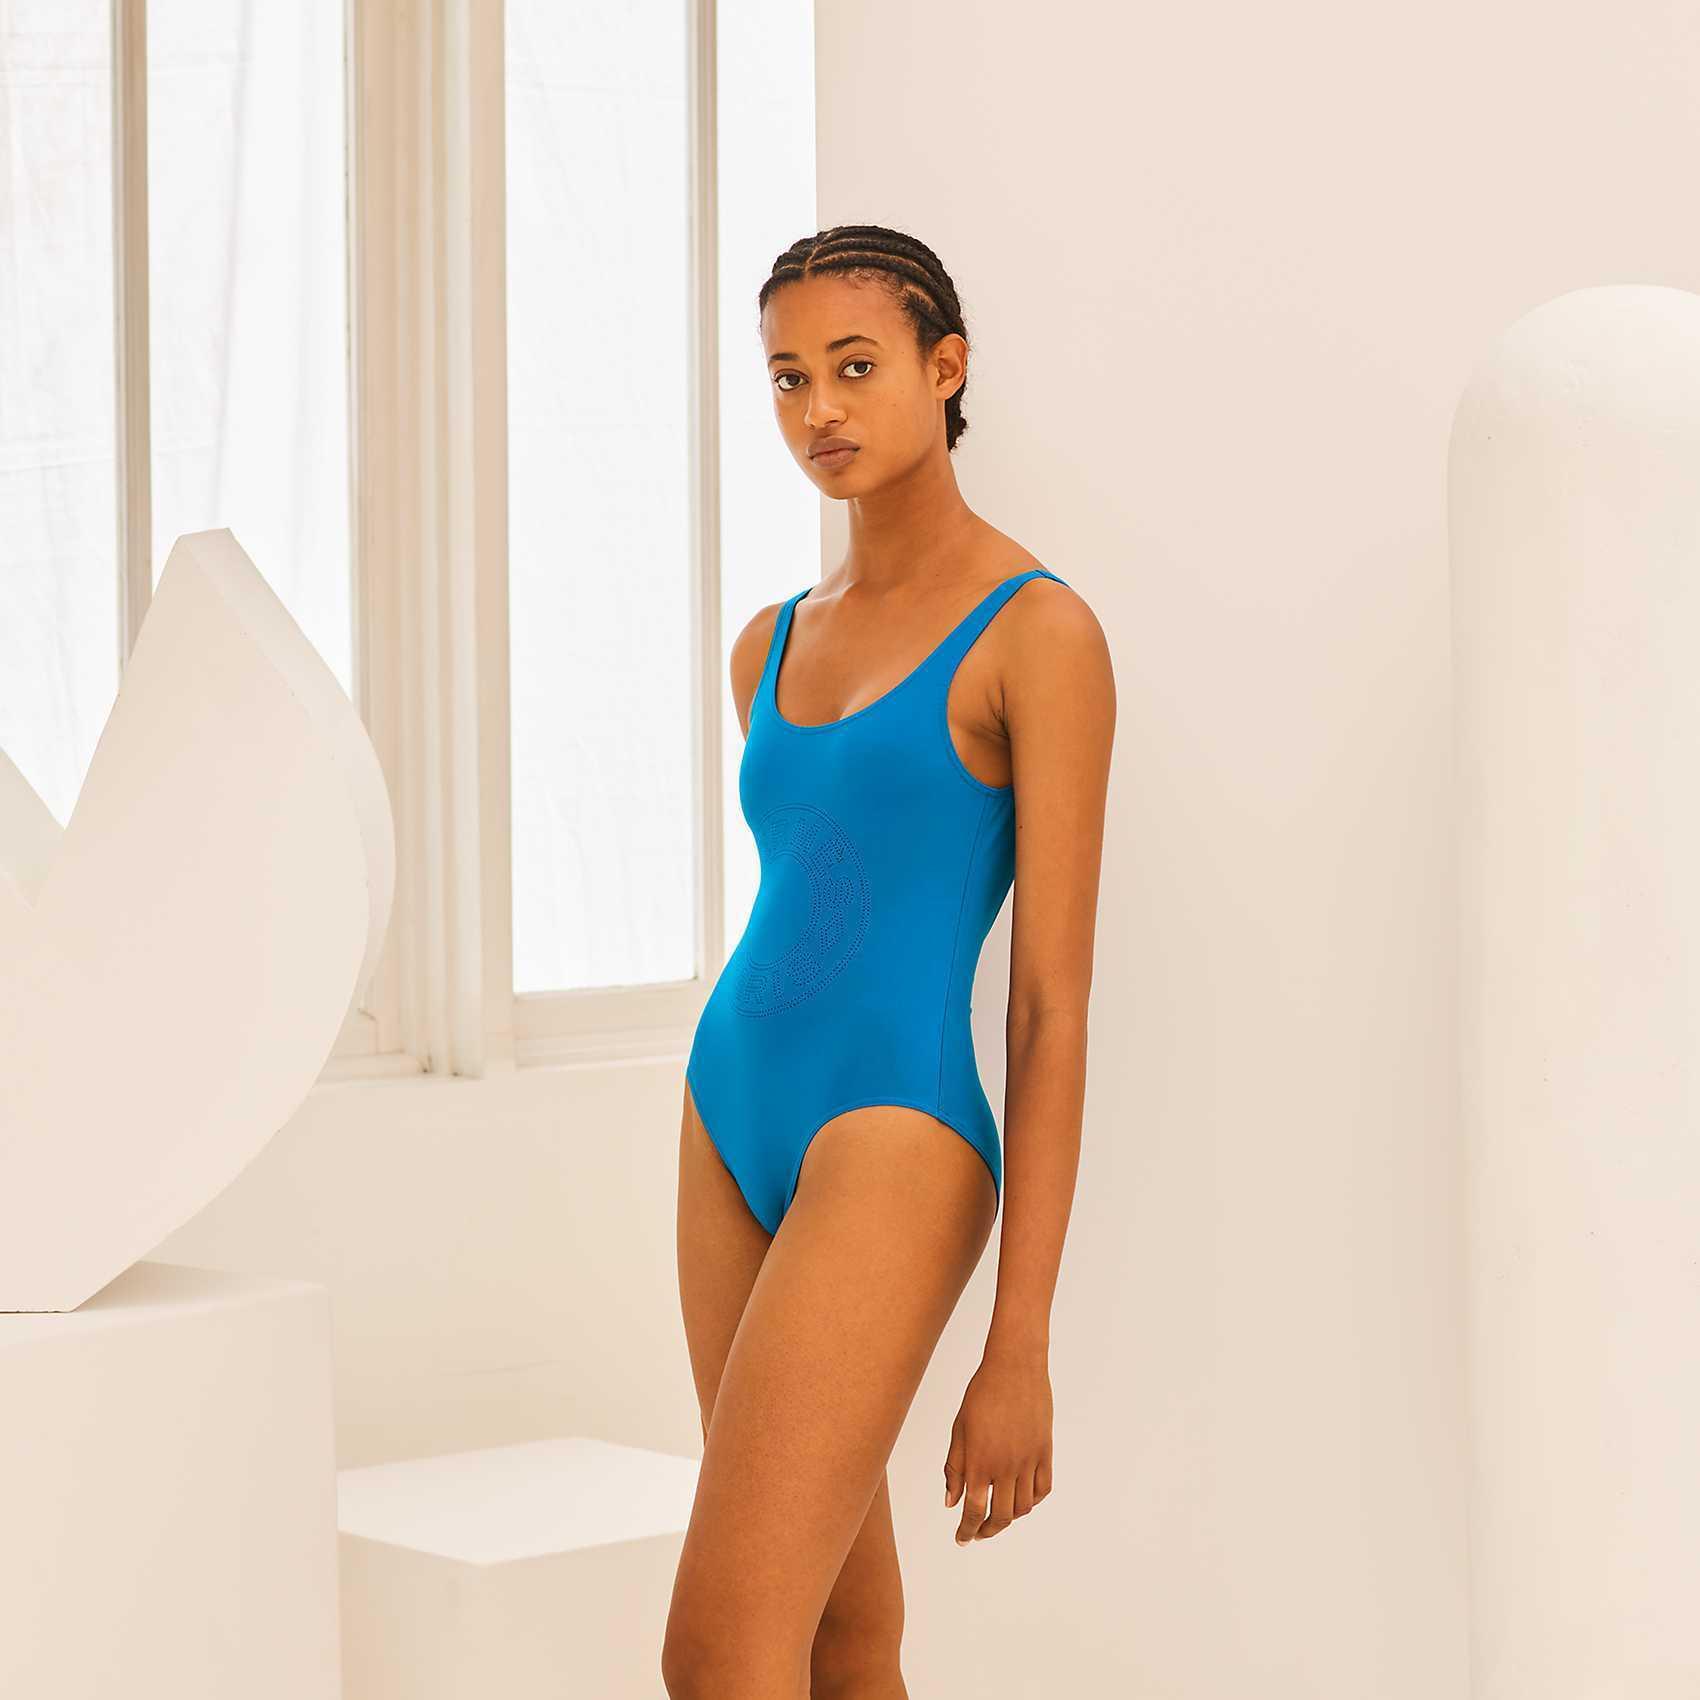 HERMES Tania Swimsuit